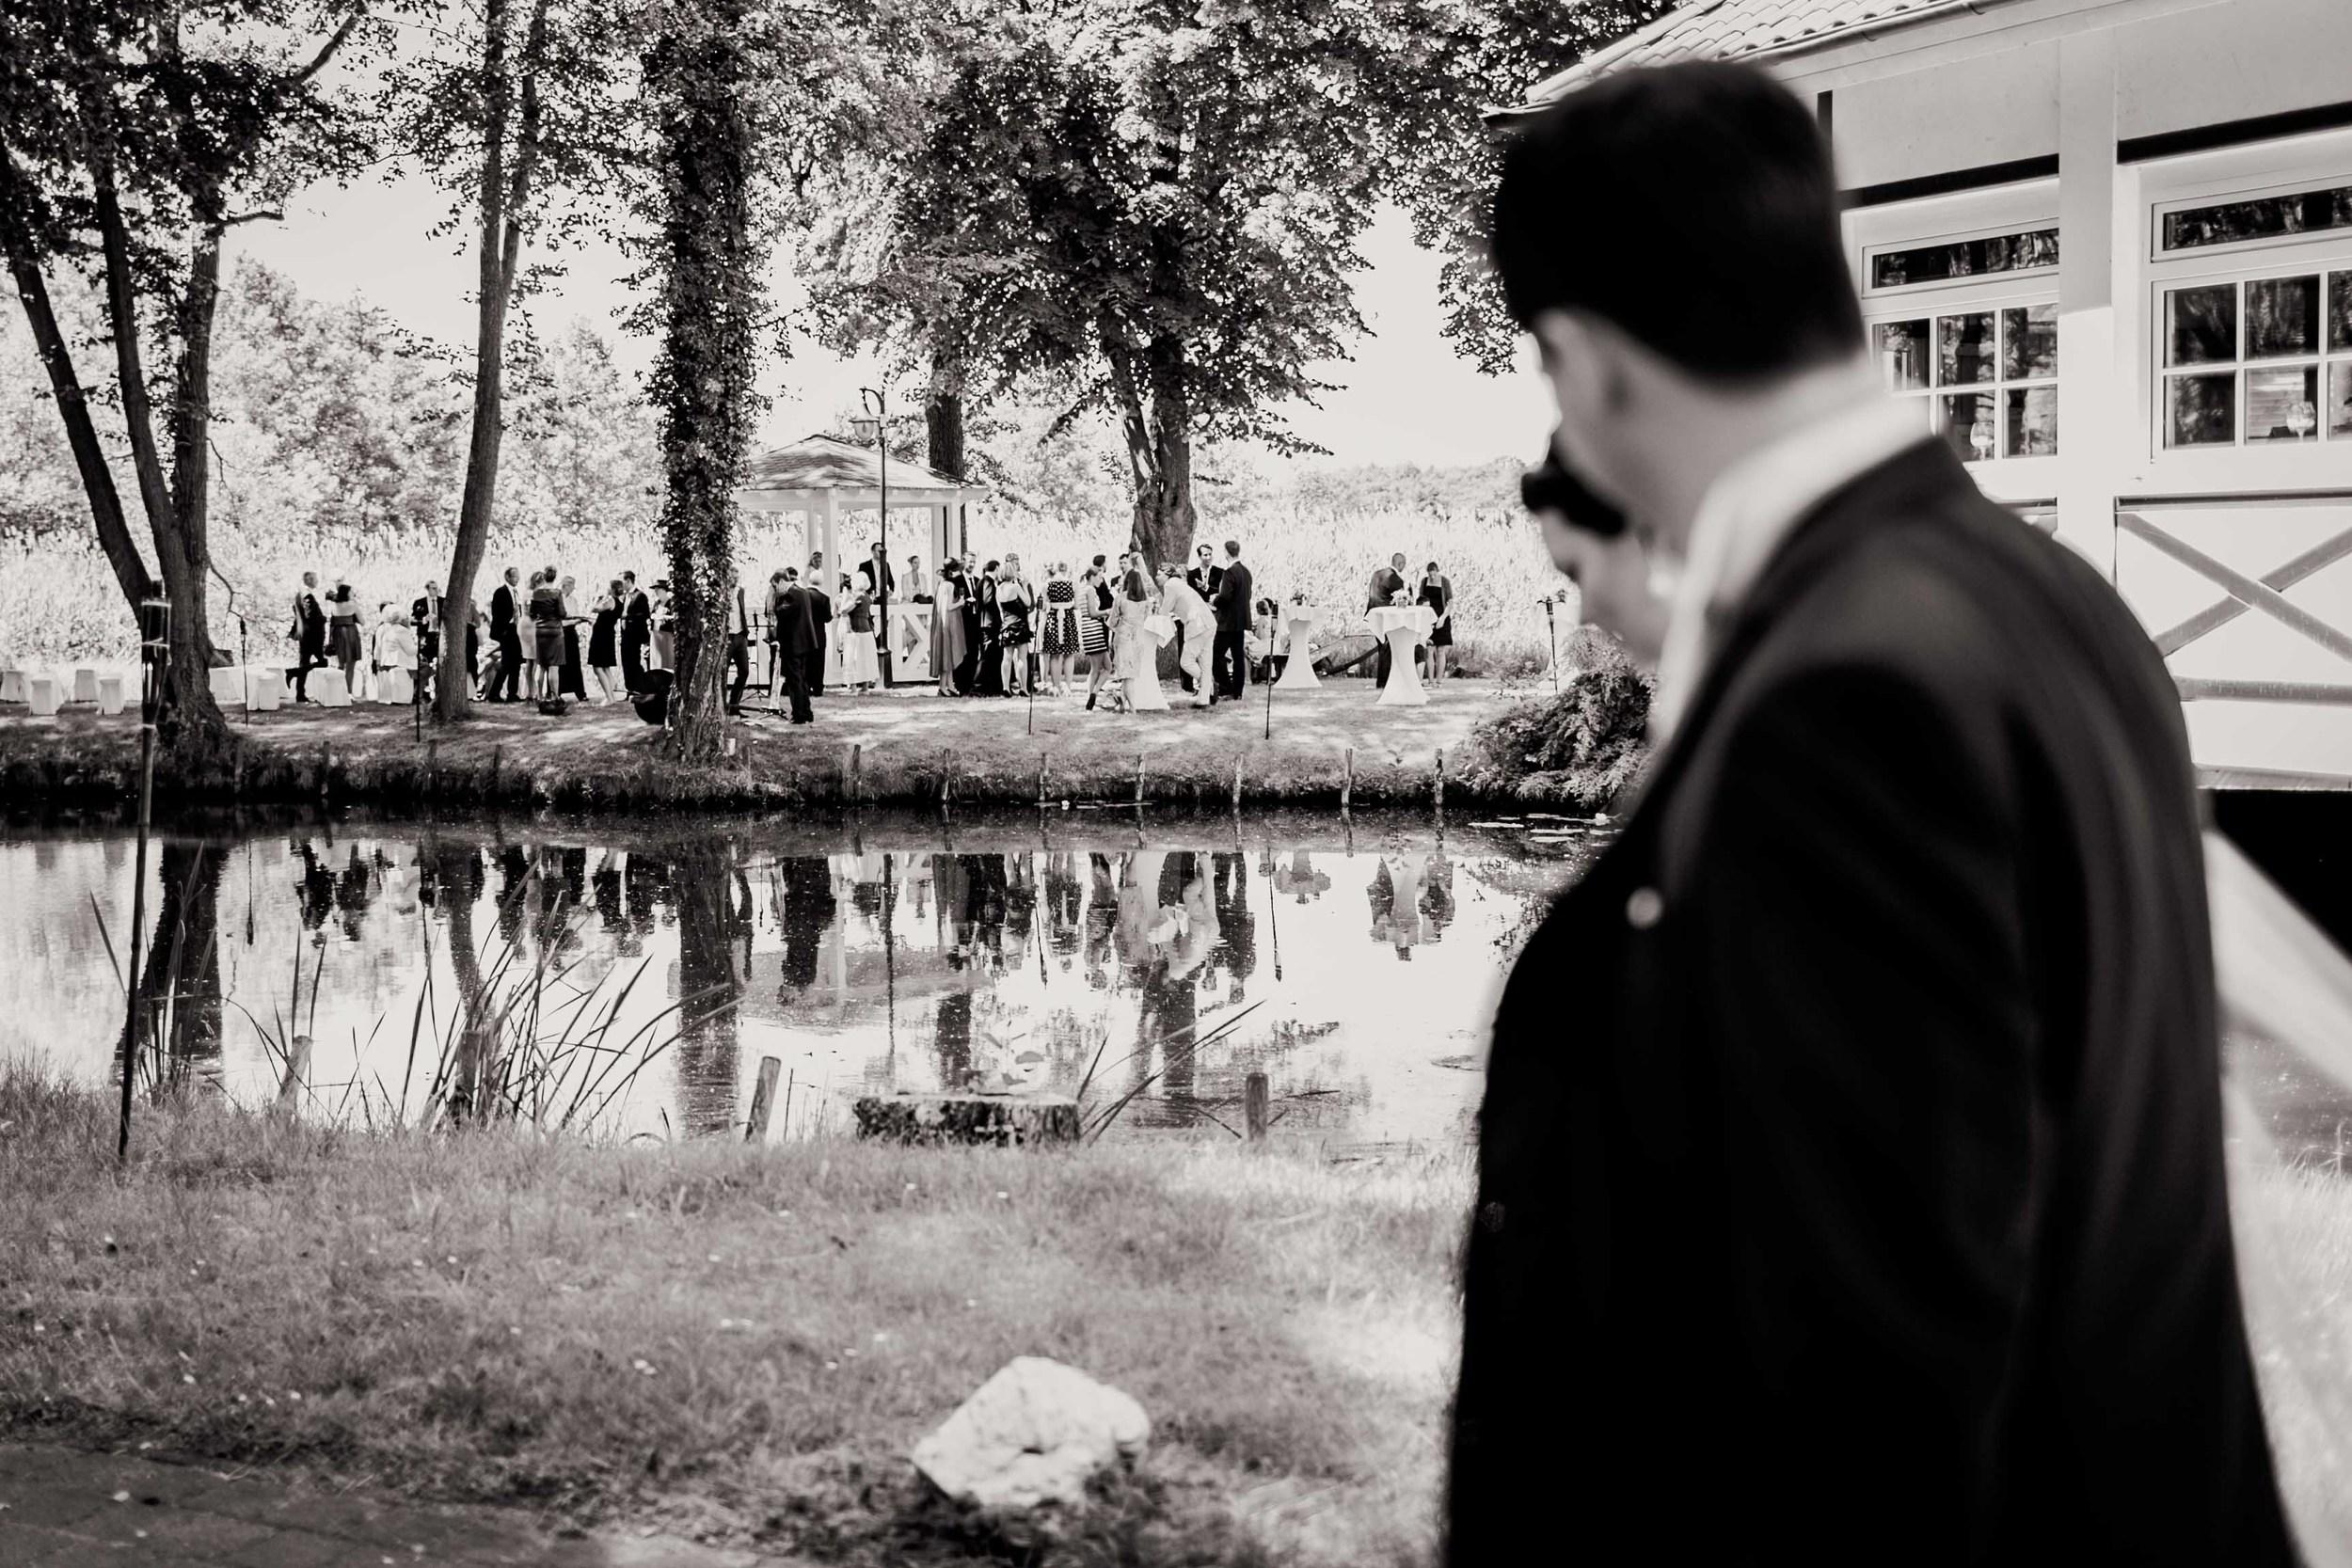 Hochzeitsfotografie Berlin_Fran Burrows Fotografie-167.jpg